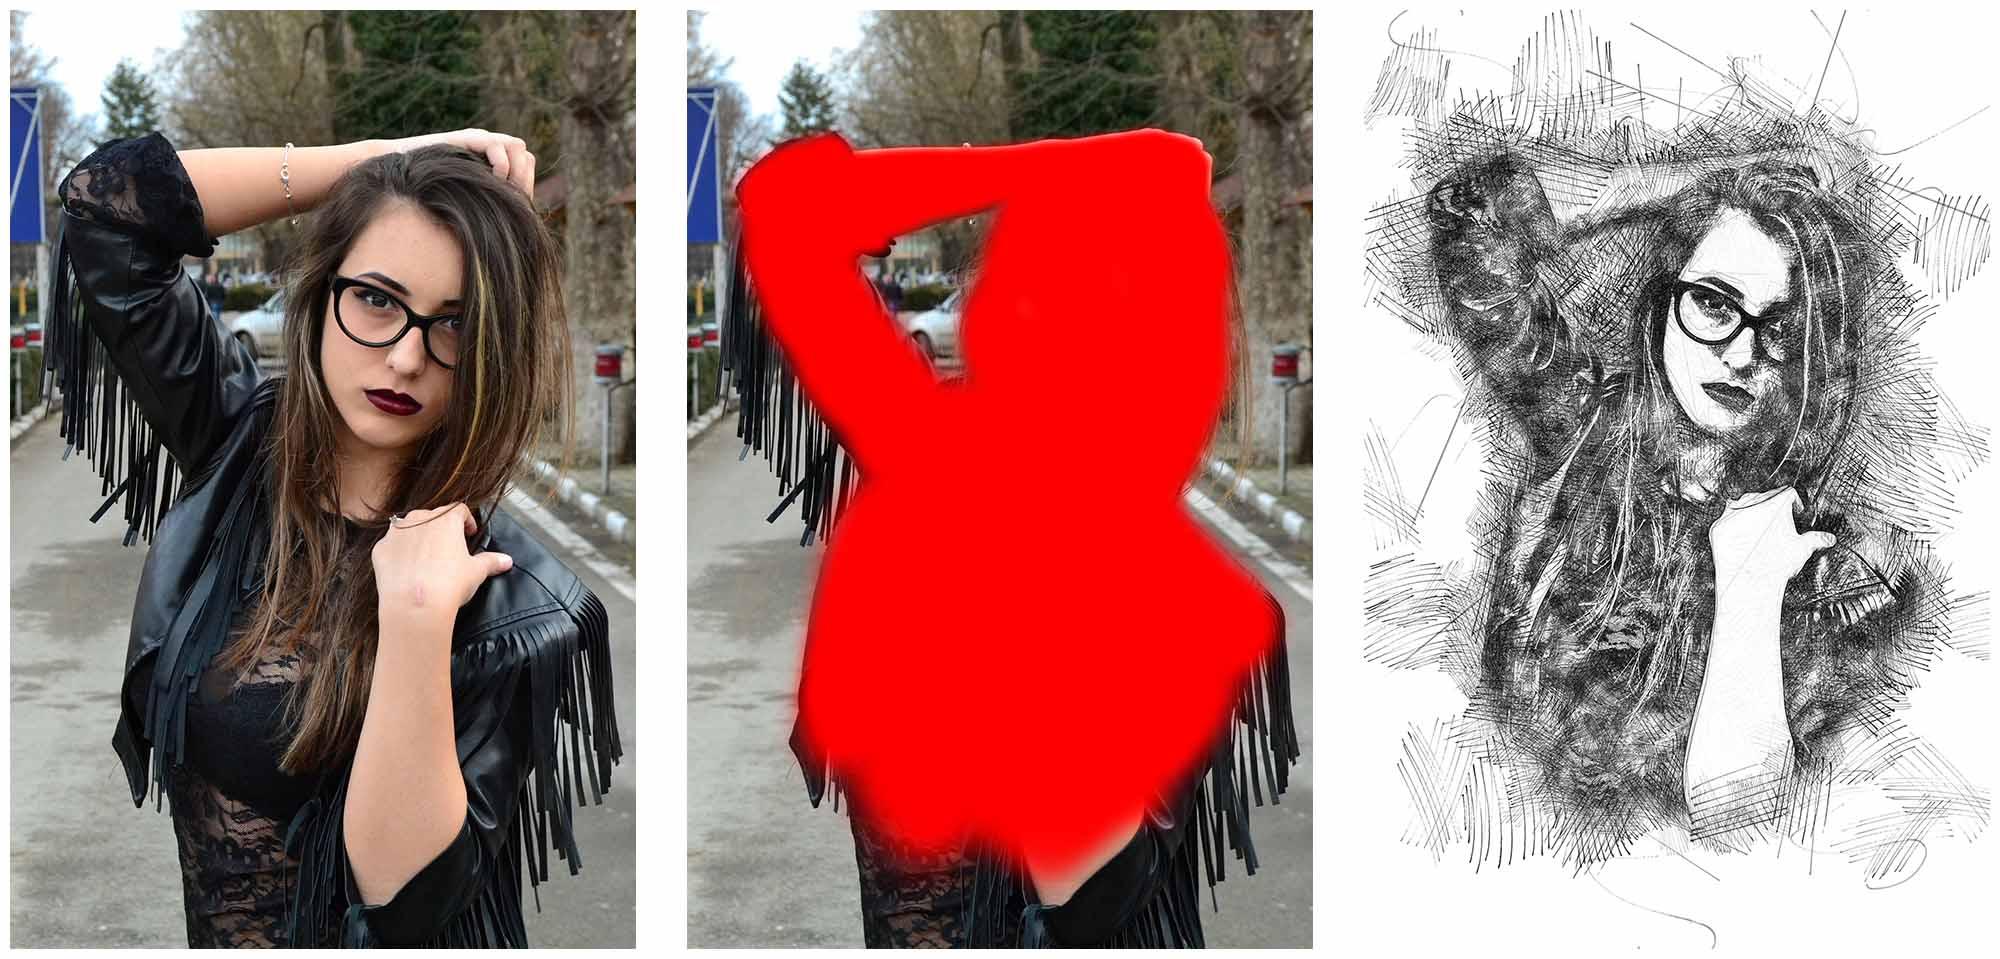 effect-that-action-created Felt-Pen Sketch Photoshop Action